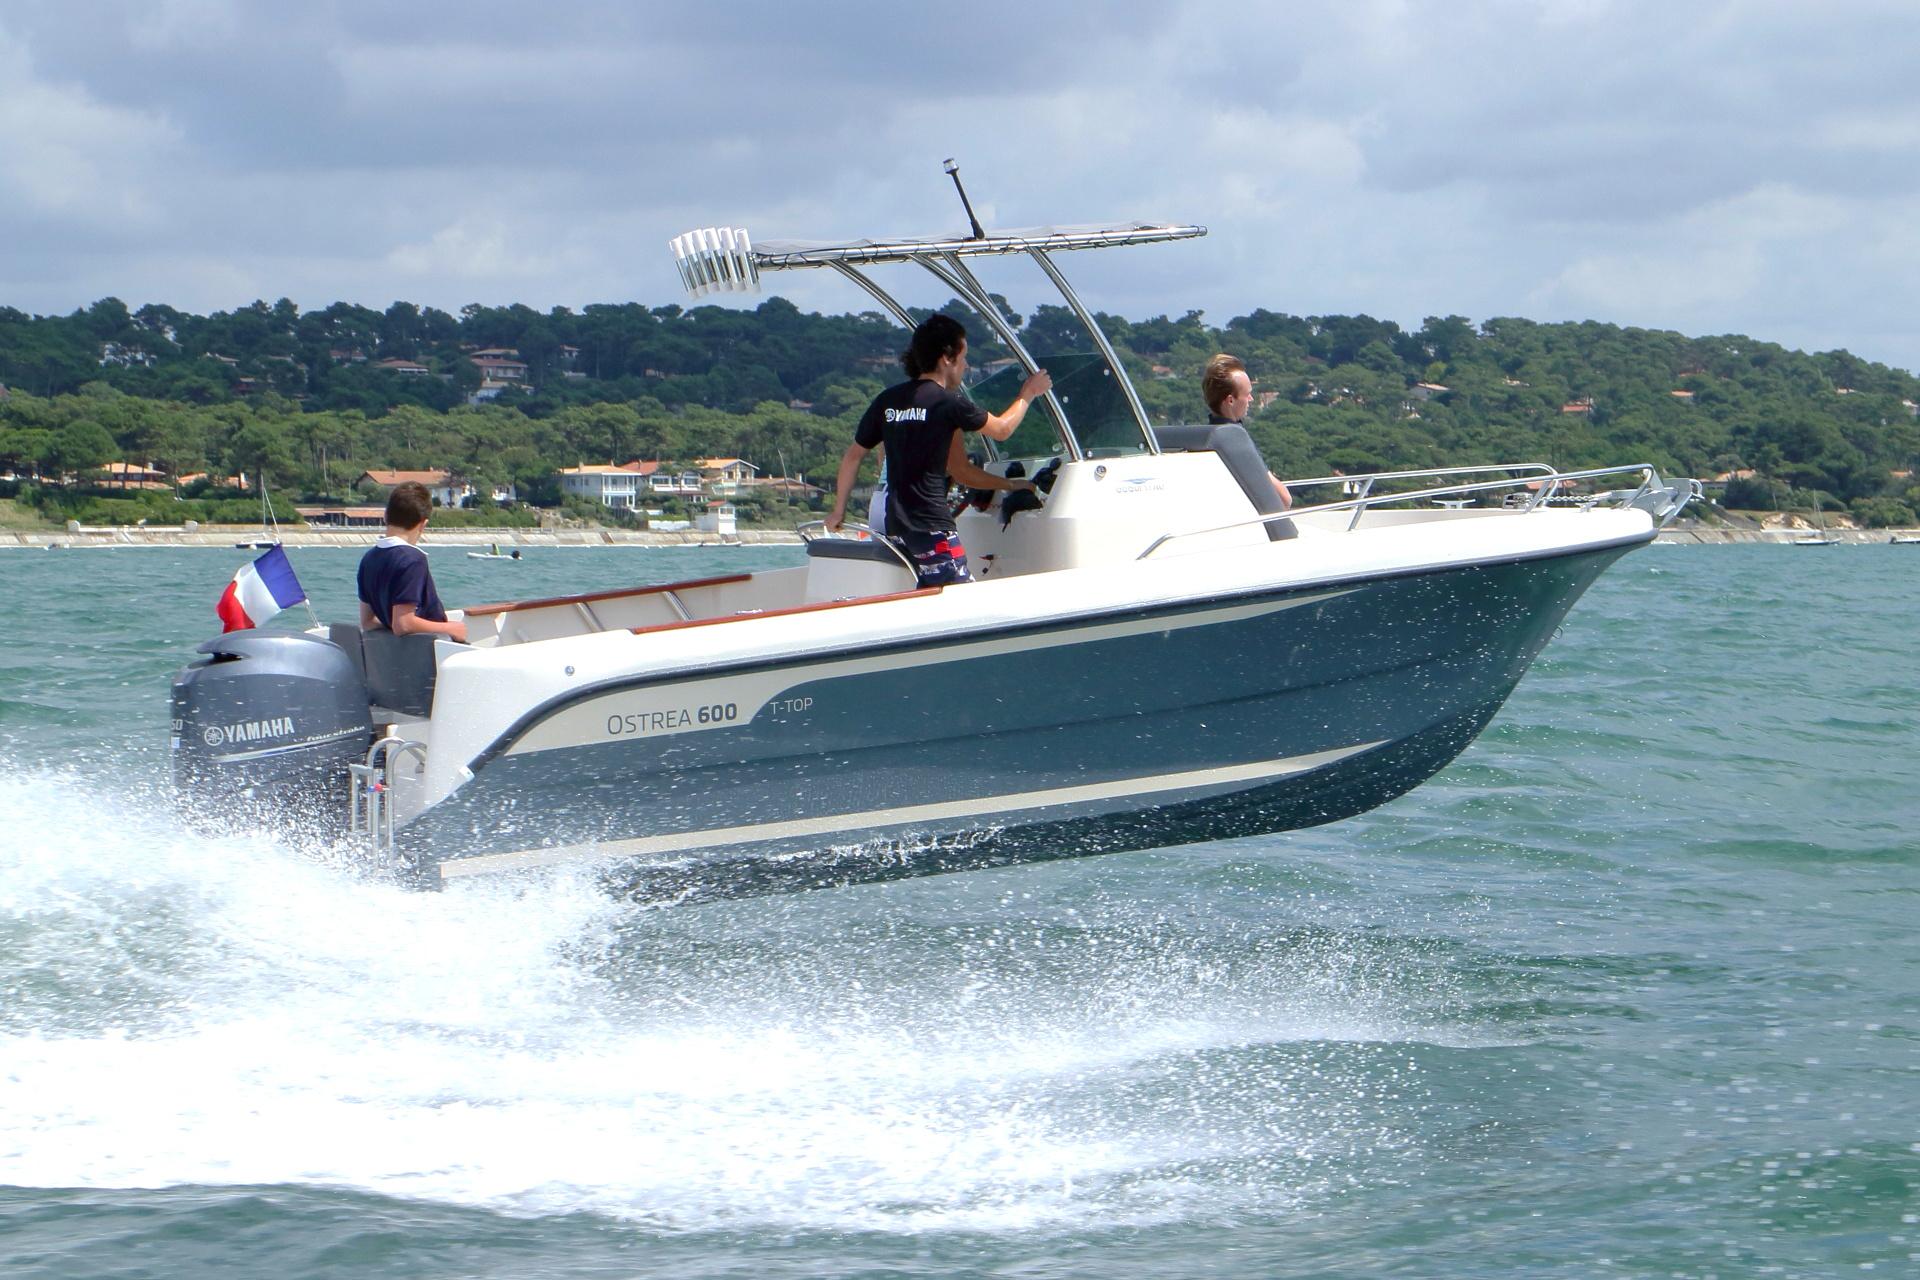 bateau  u00e0 moteur ocqueteau ostrea 600 open t-top